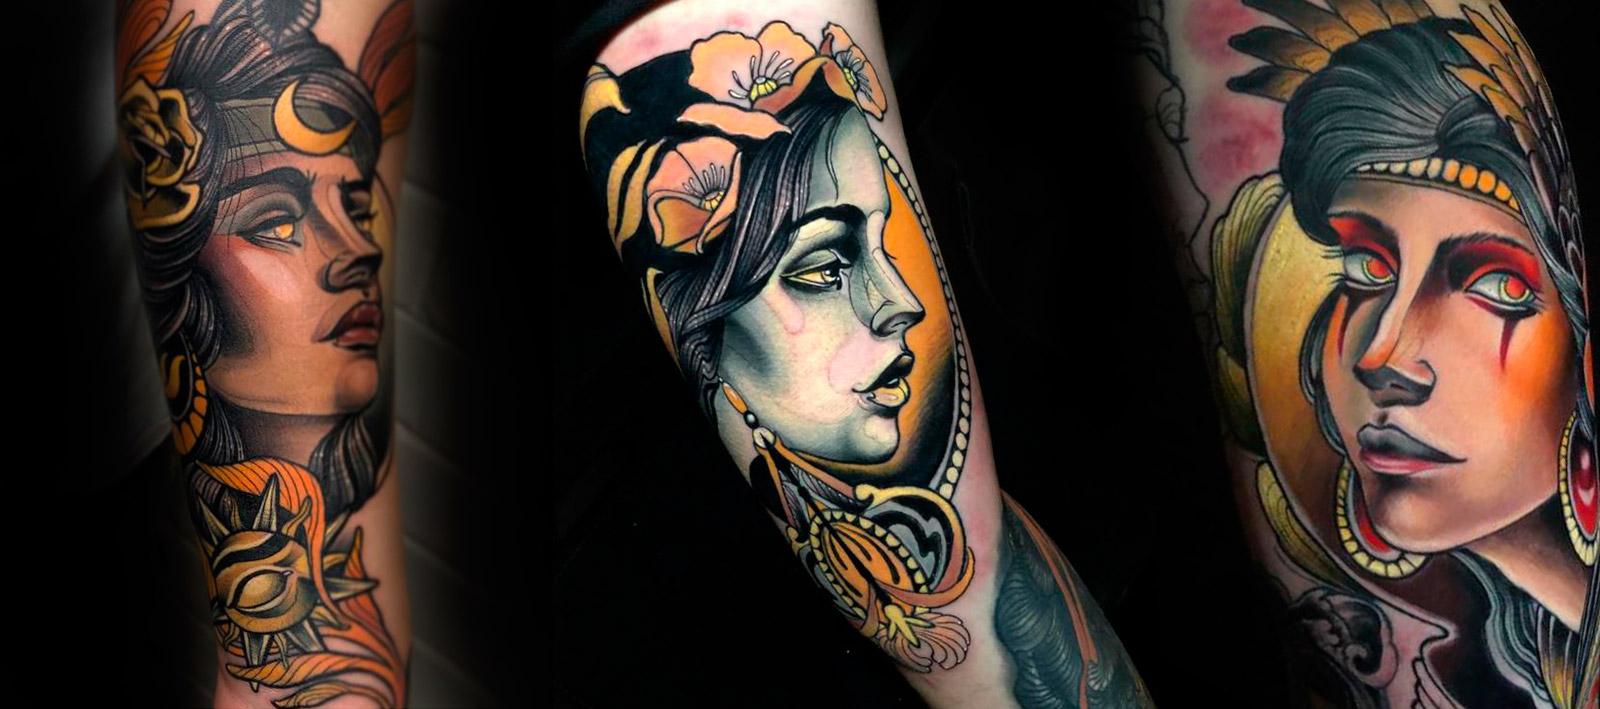 tatuajes-bilbao-2021022021t